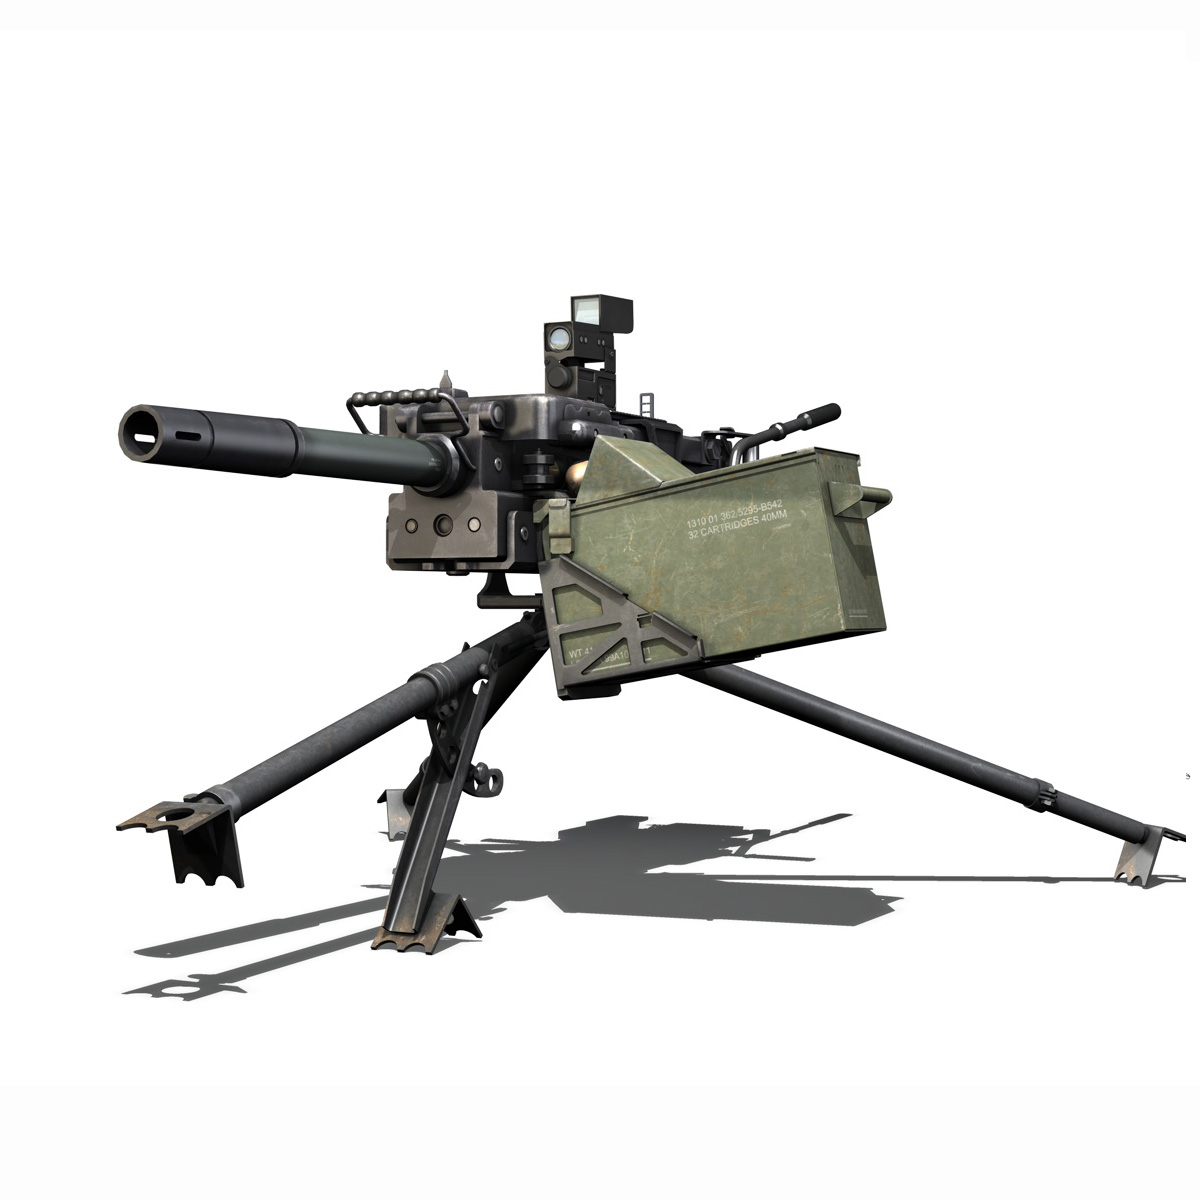 how to buy a machine gun in pa